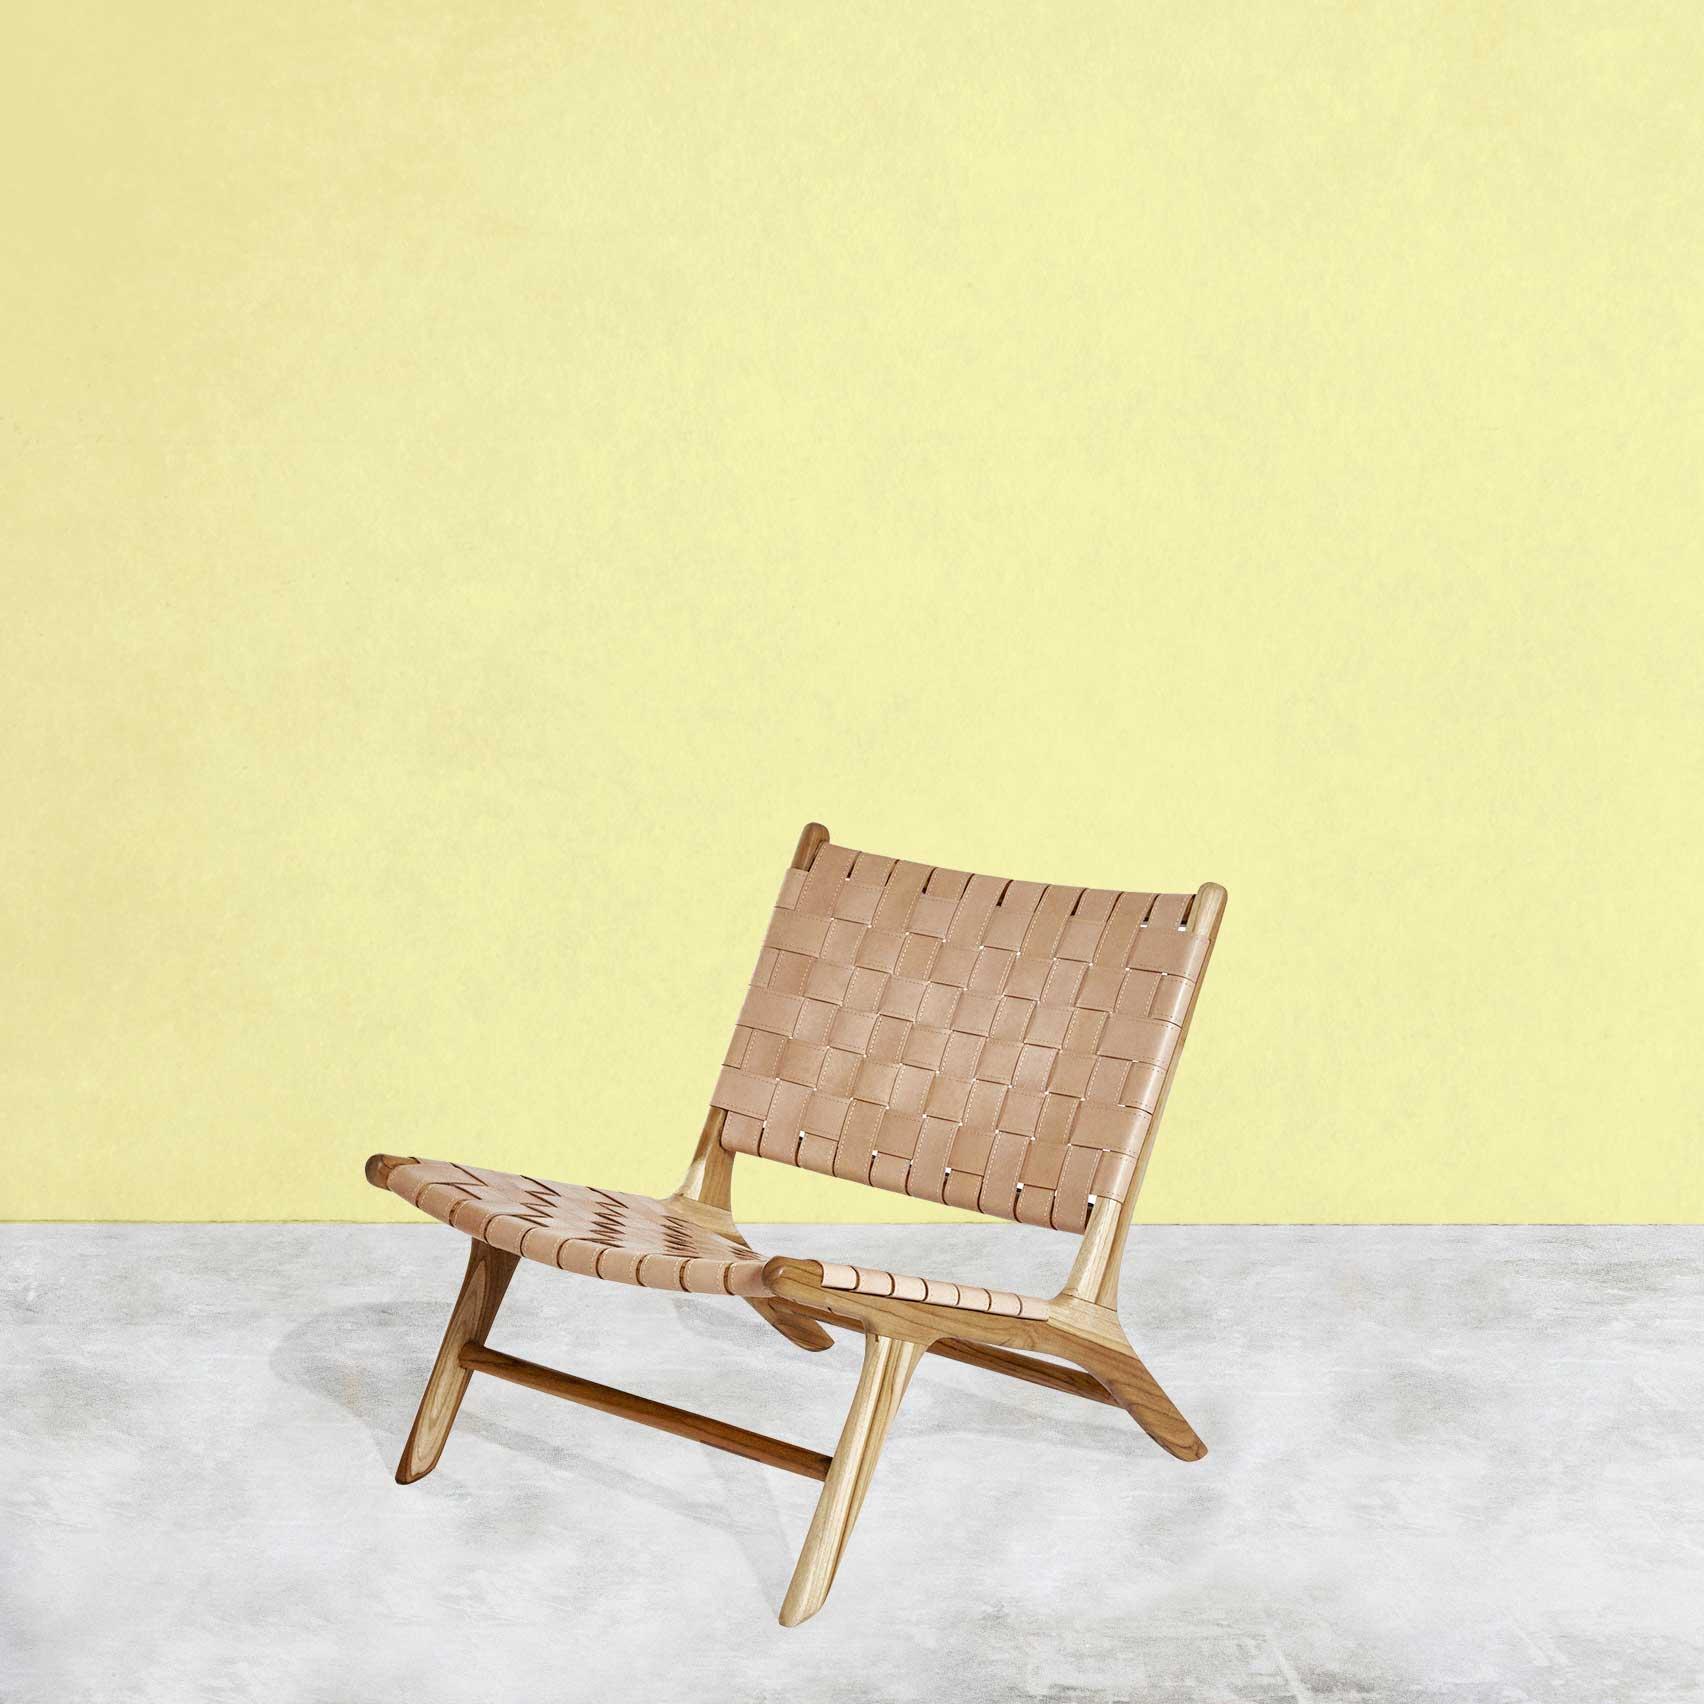 _encoded-lounge-chair-LE_MILE_Magazine_LE_MILE_SeLECTED_European_Furniture_Design_2018.jpg